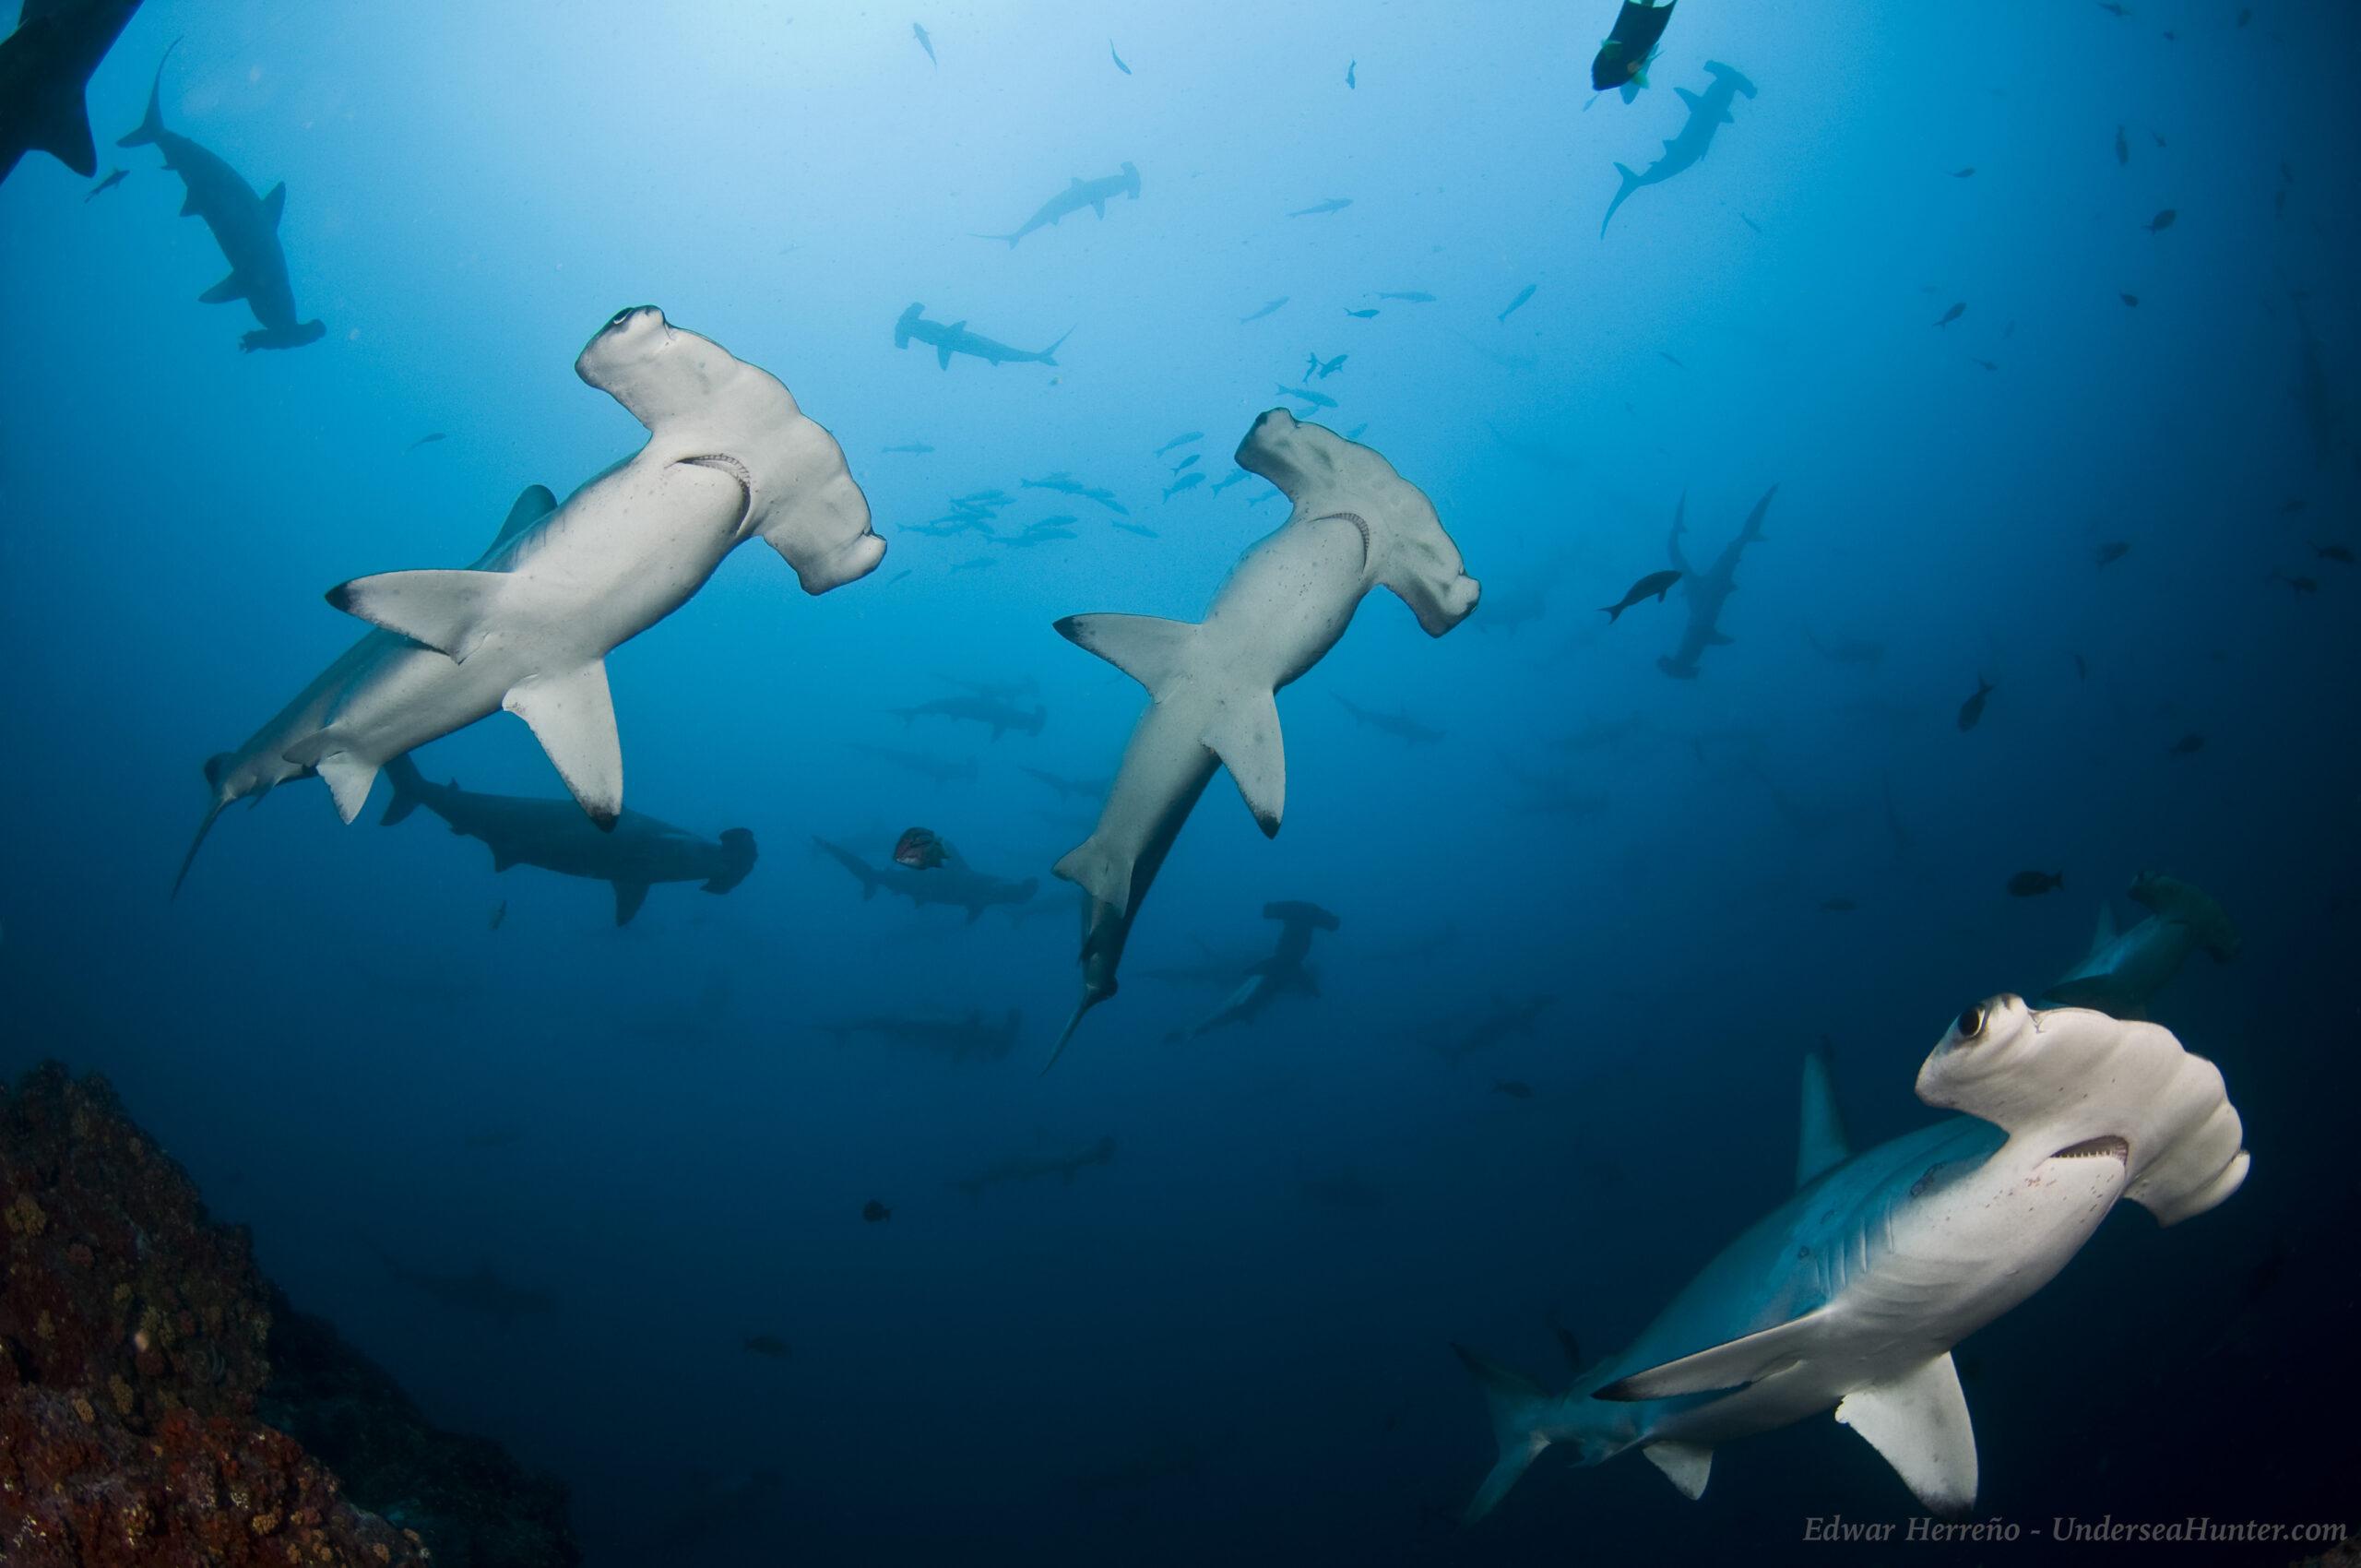 American Airlines Will No Longer Ship Shark Fins